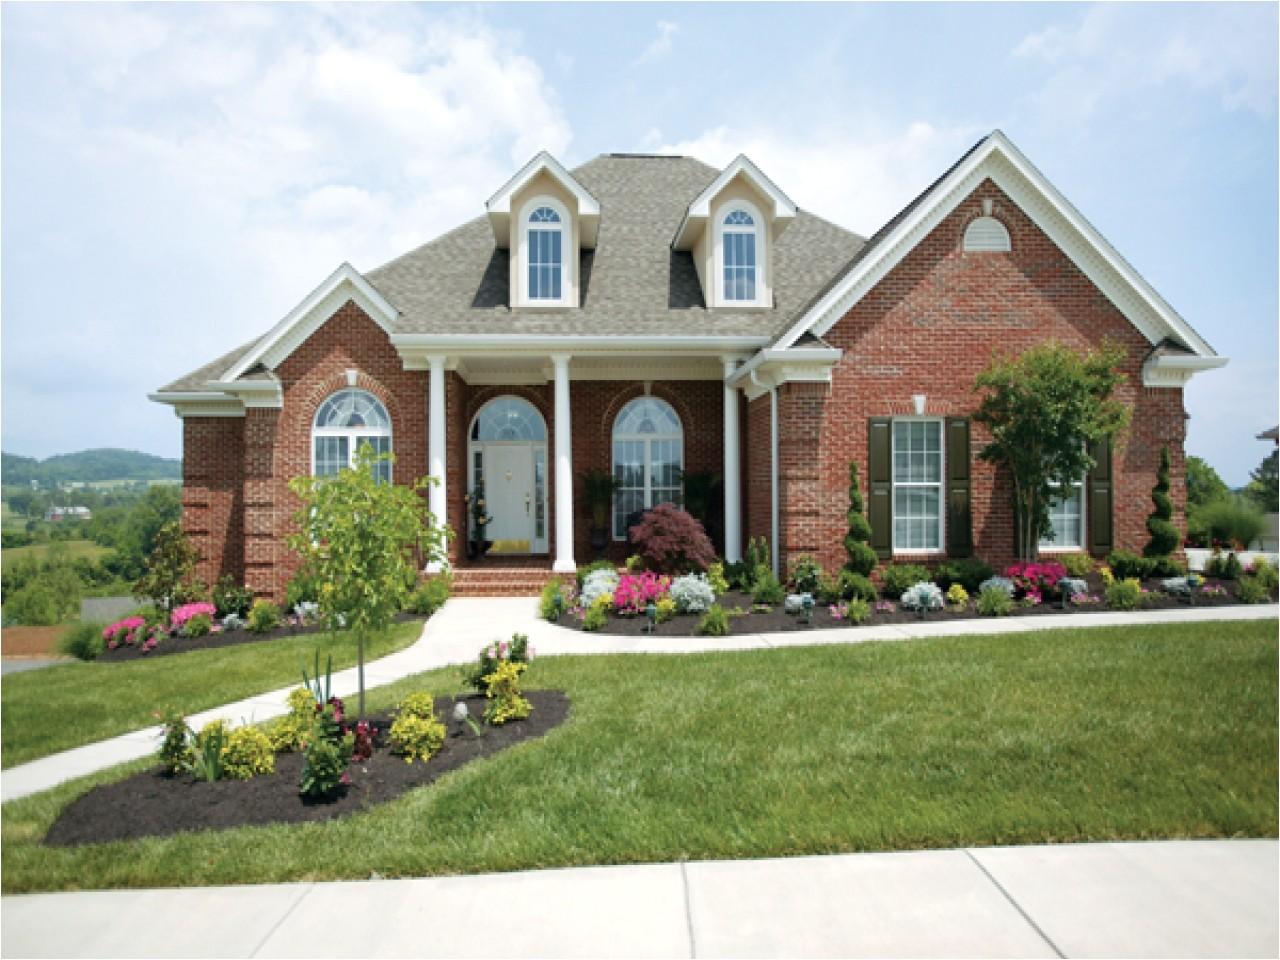 d548da4ba83065af one story house plans with wrap around porch one story house plans